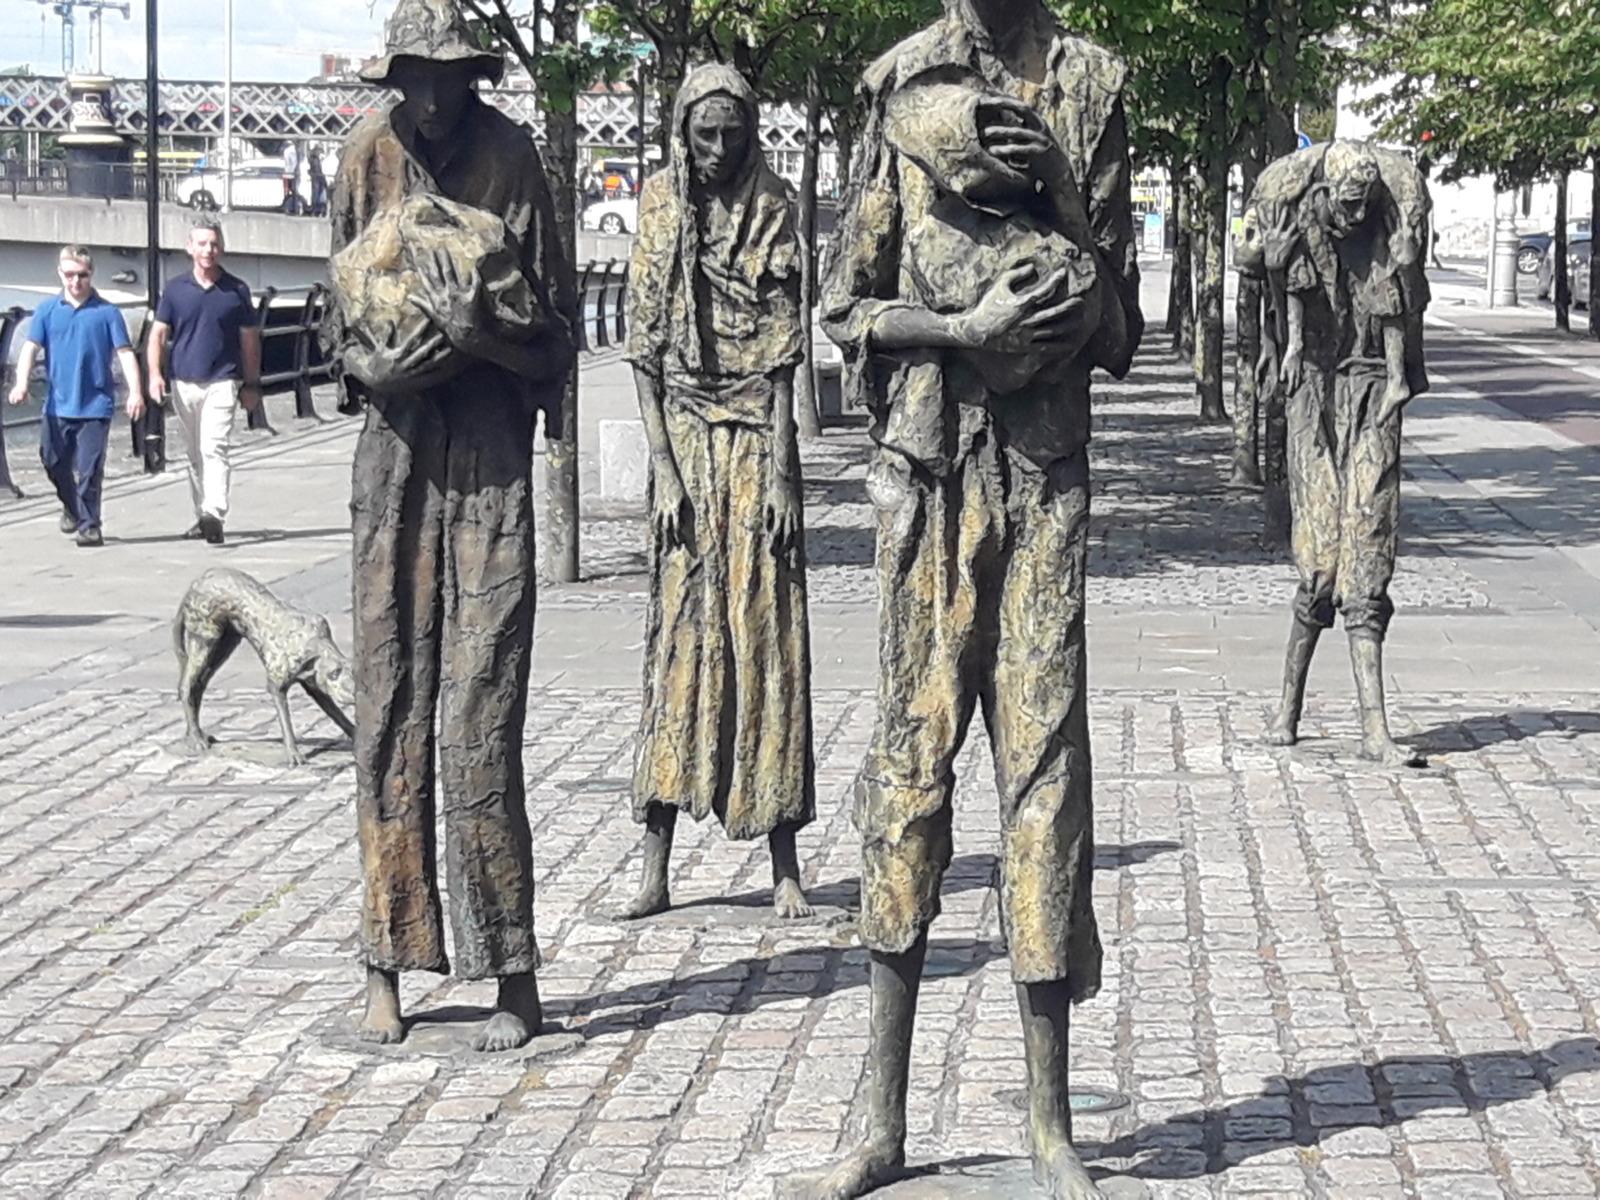 Statue of skinny people